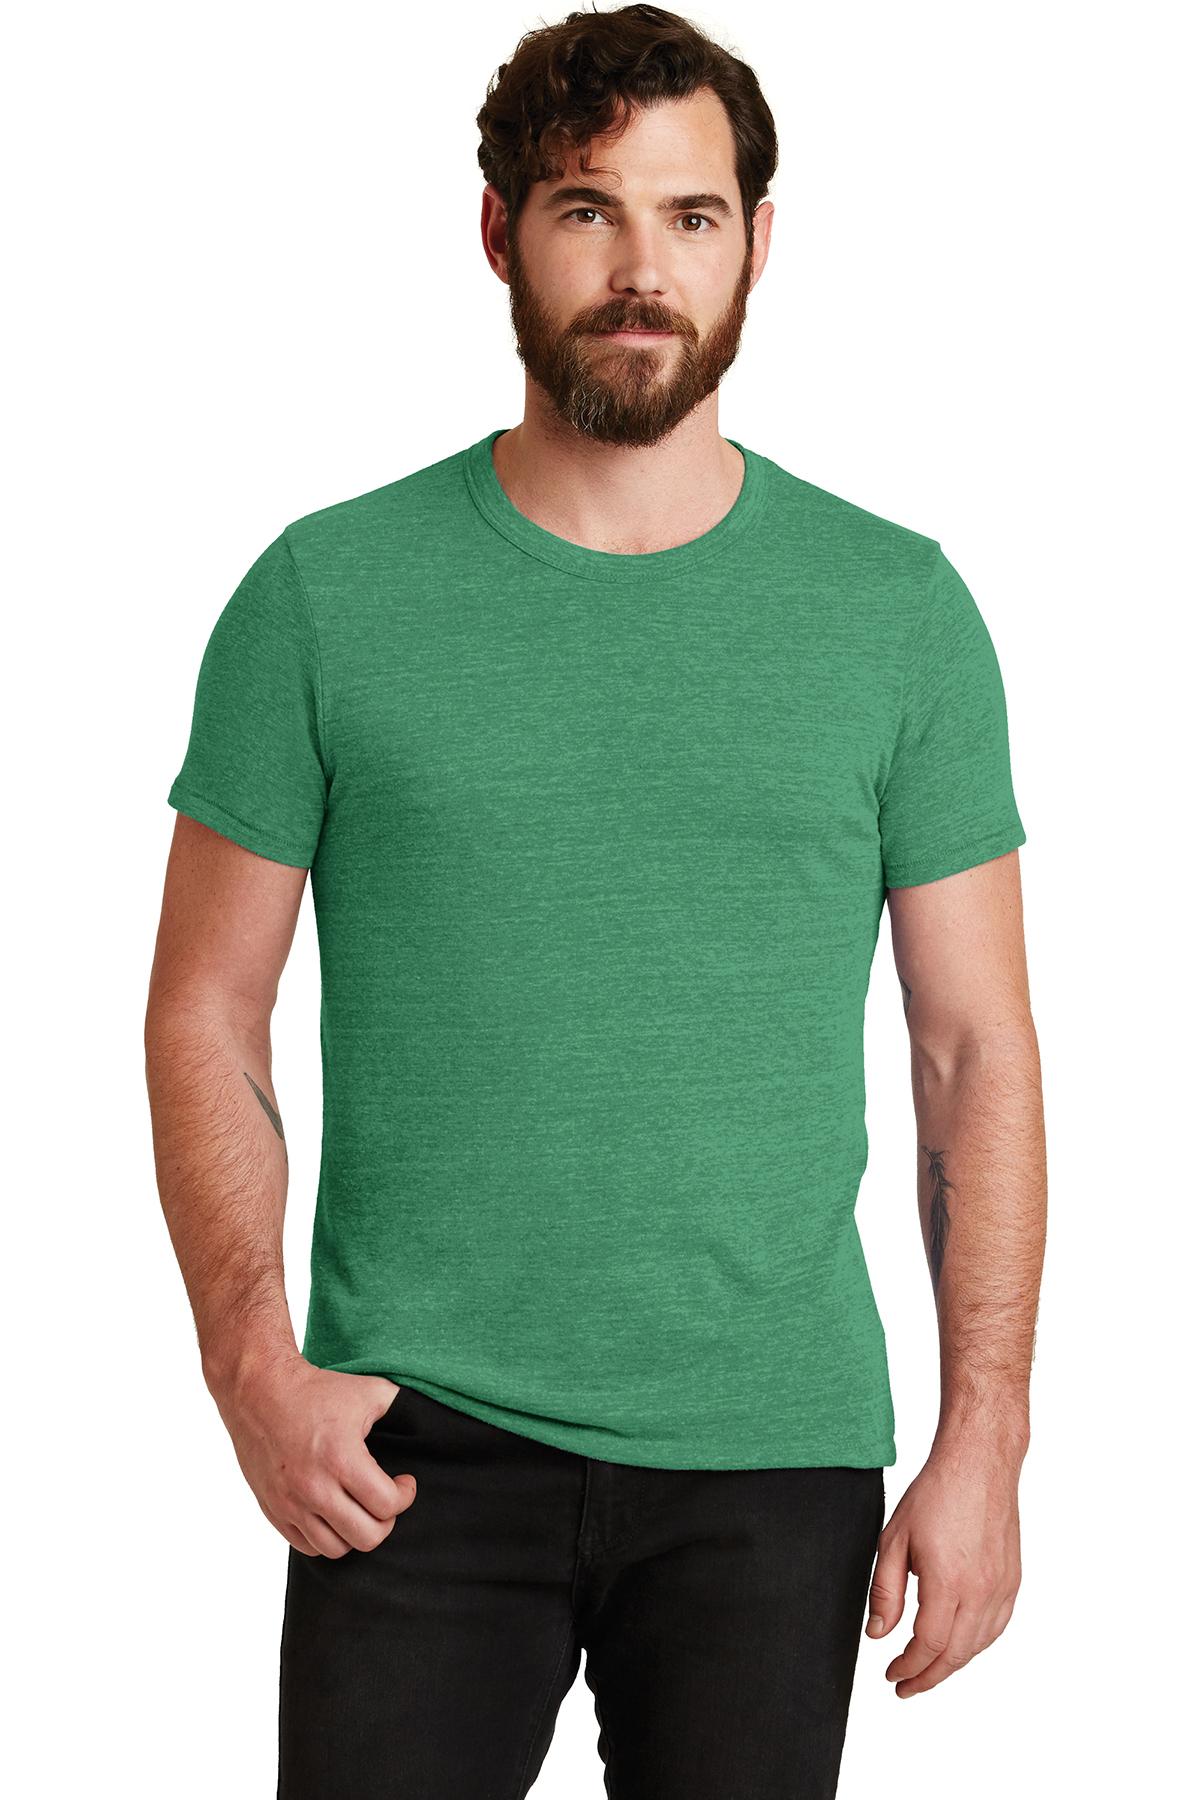 b658e23b60864 Alternative Eco-Jersey™ Crew T-Shirt | Alternative Apparel | Brands ...